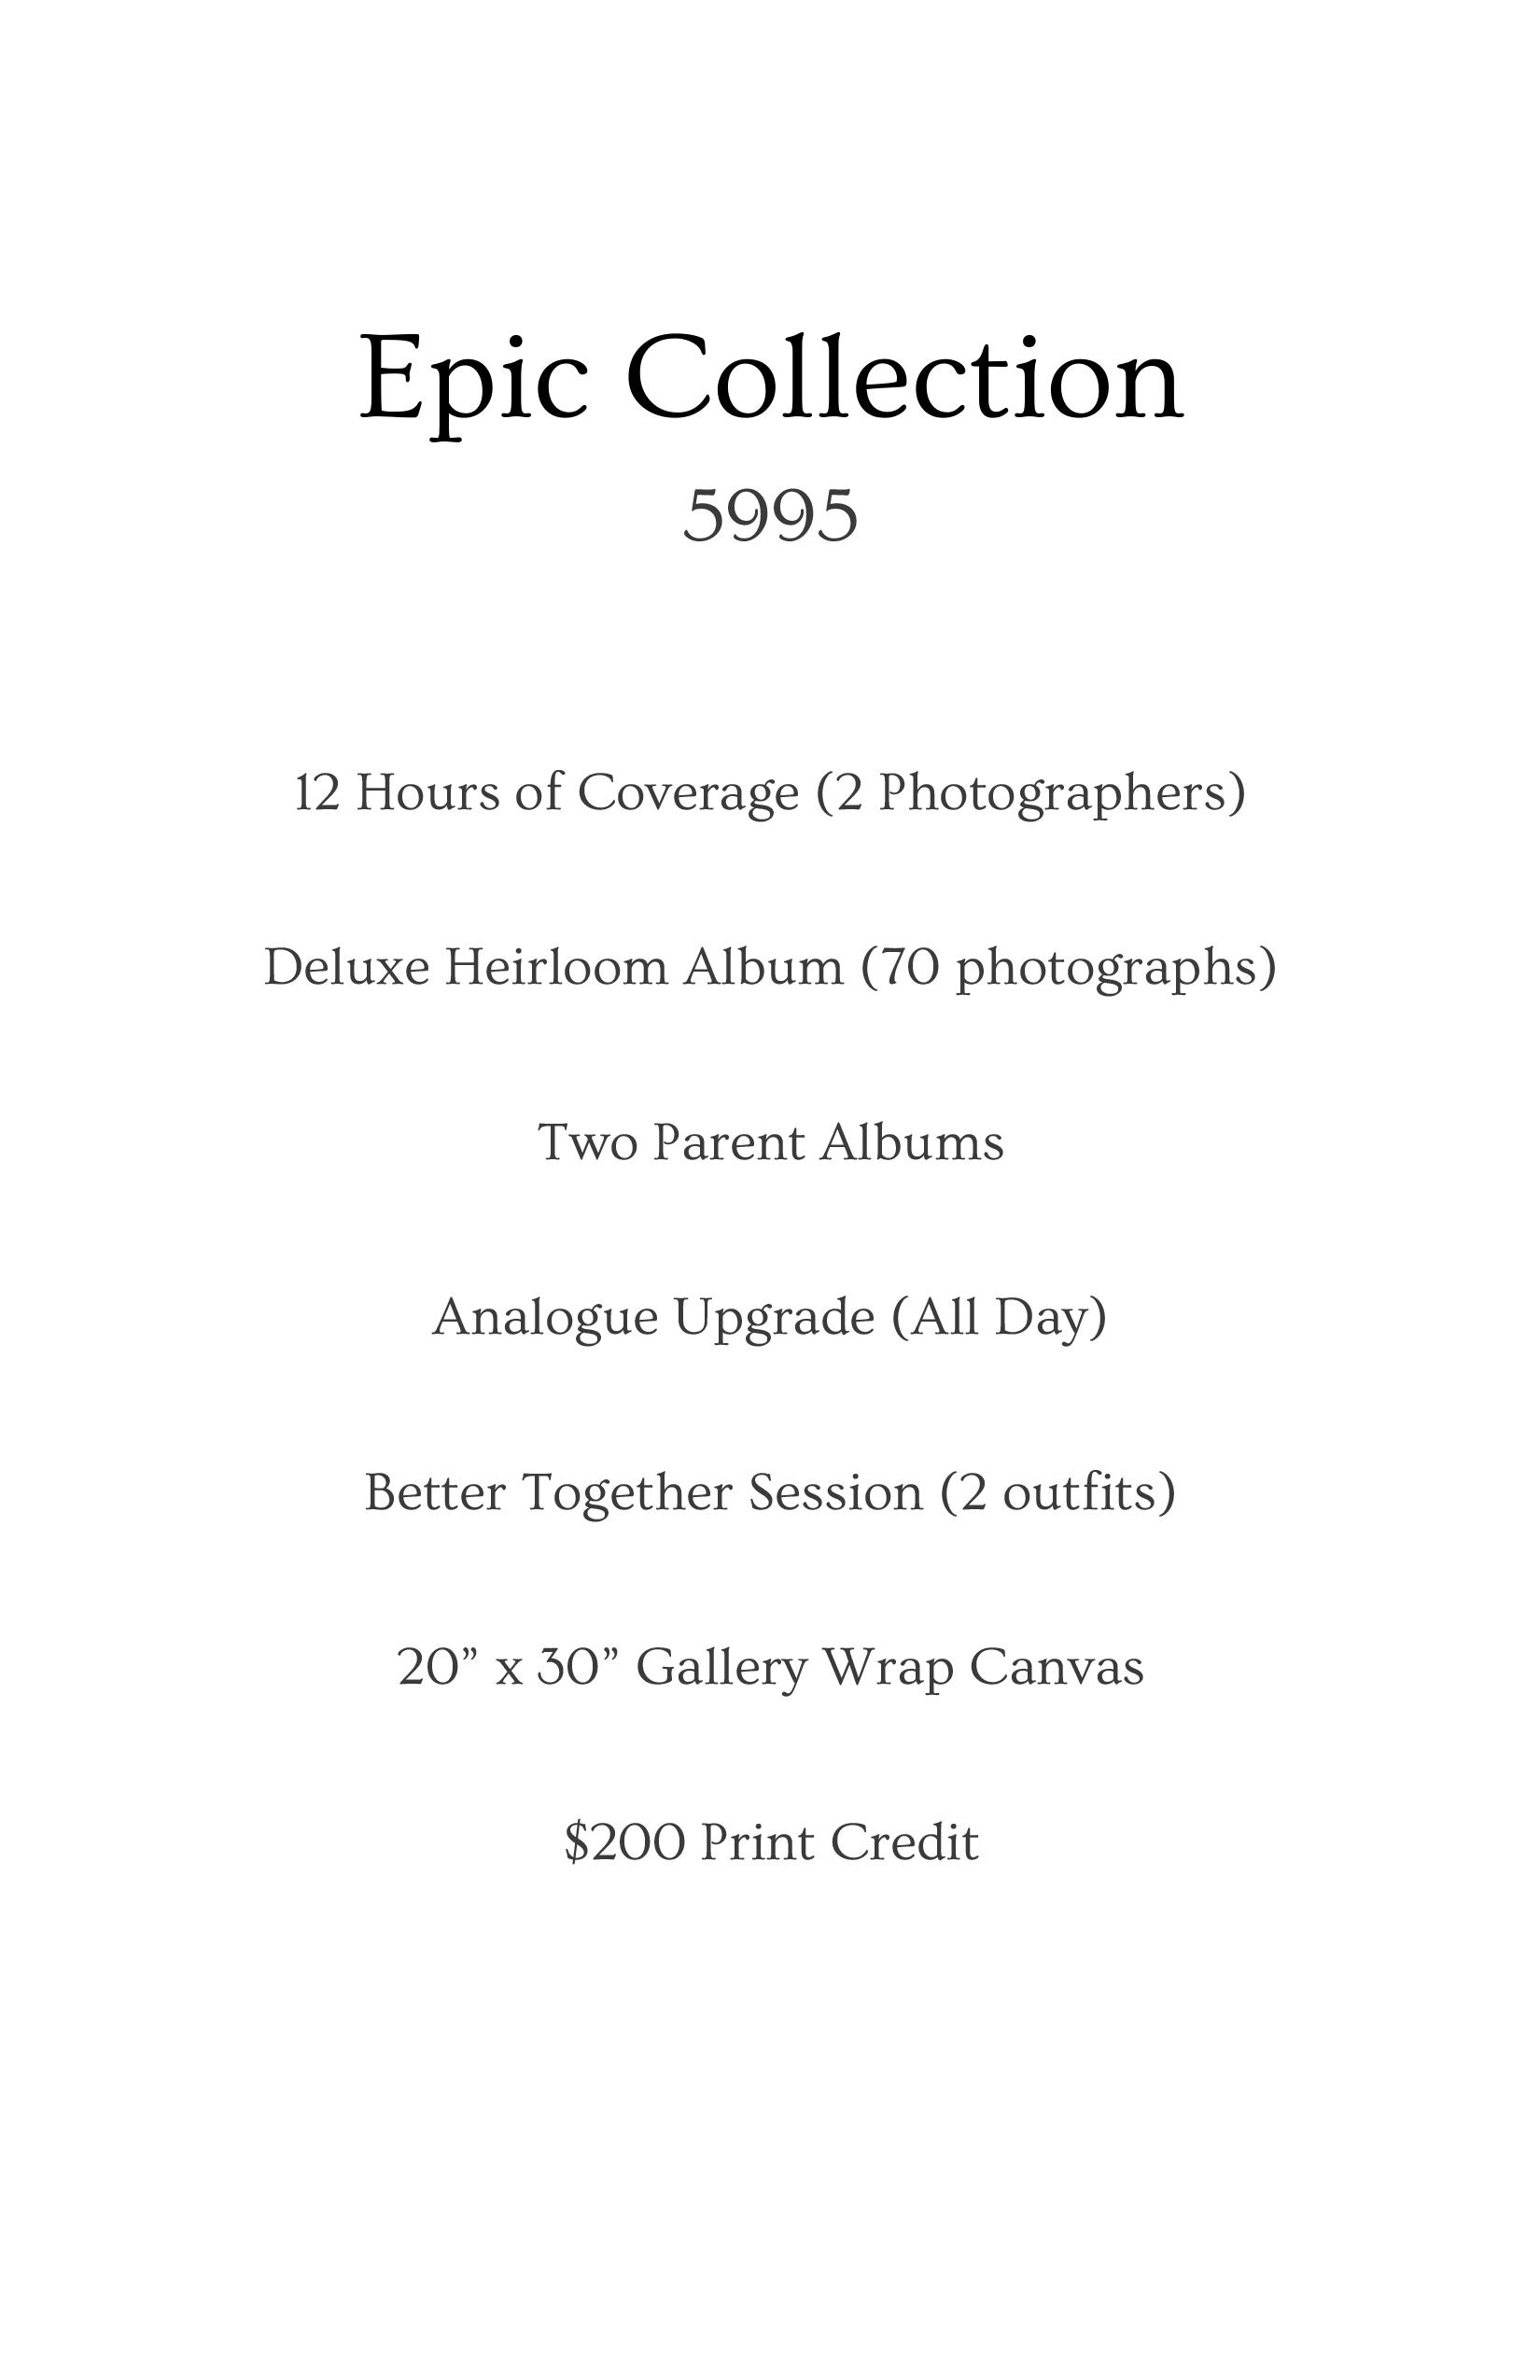 2017 Wedding Pricing Cards - 01Epic.jpg